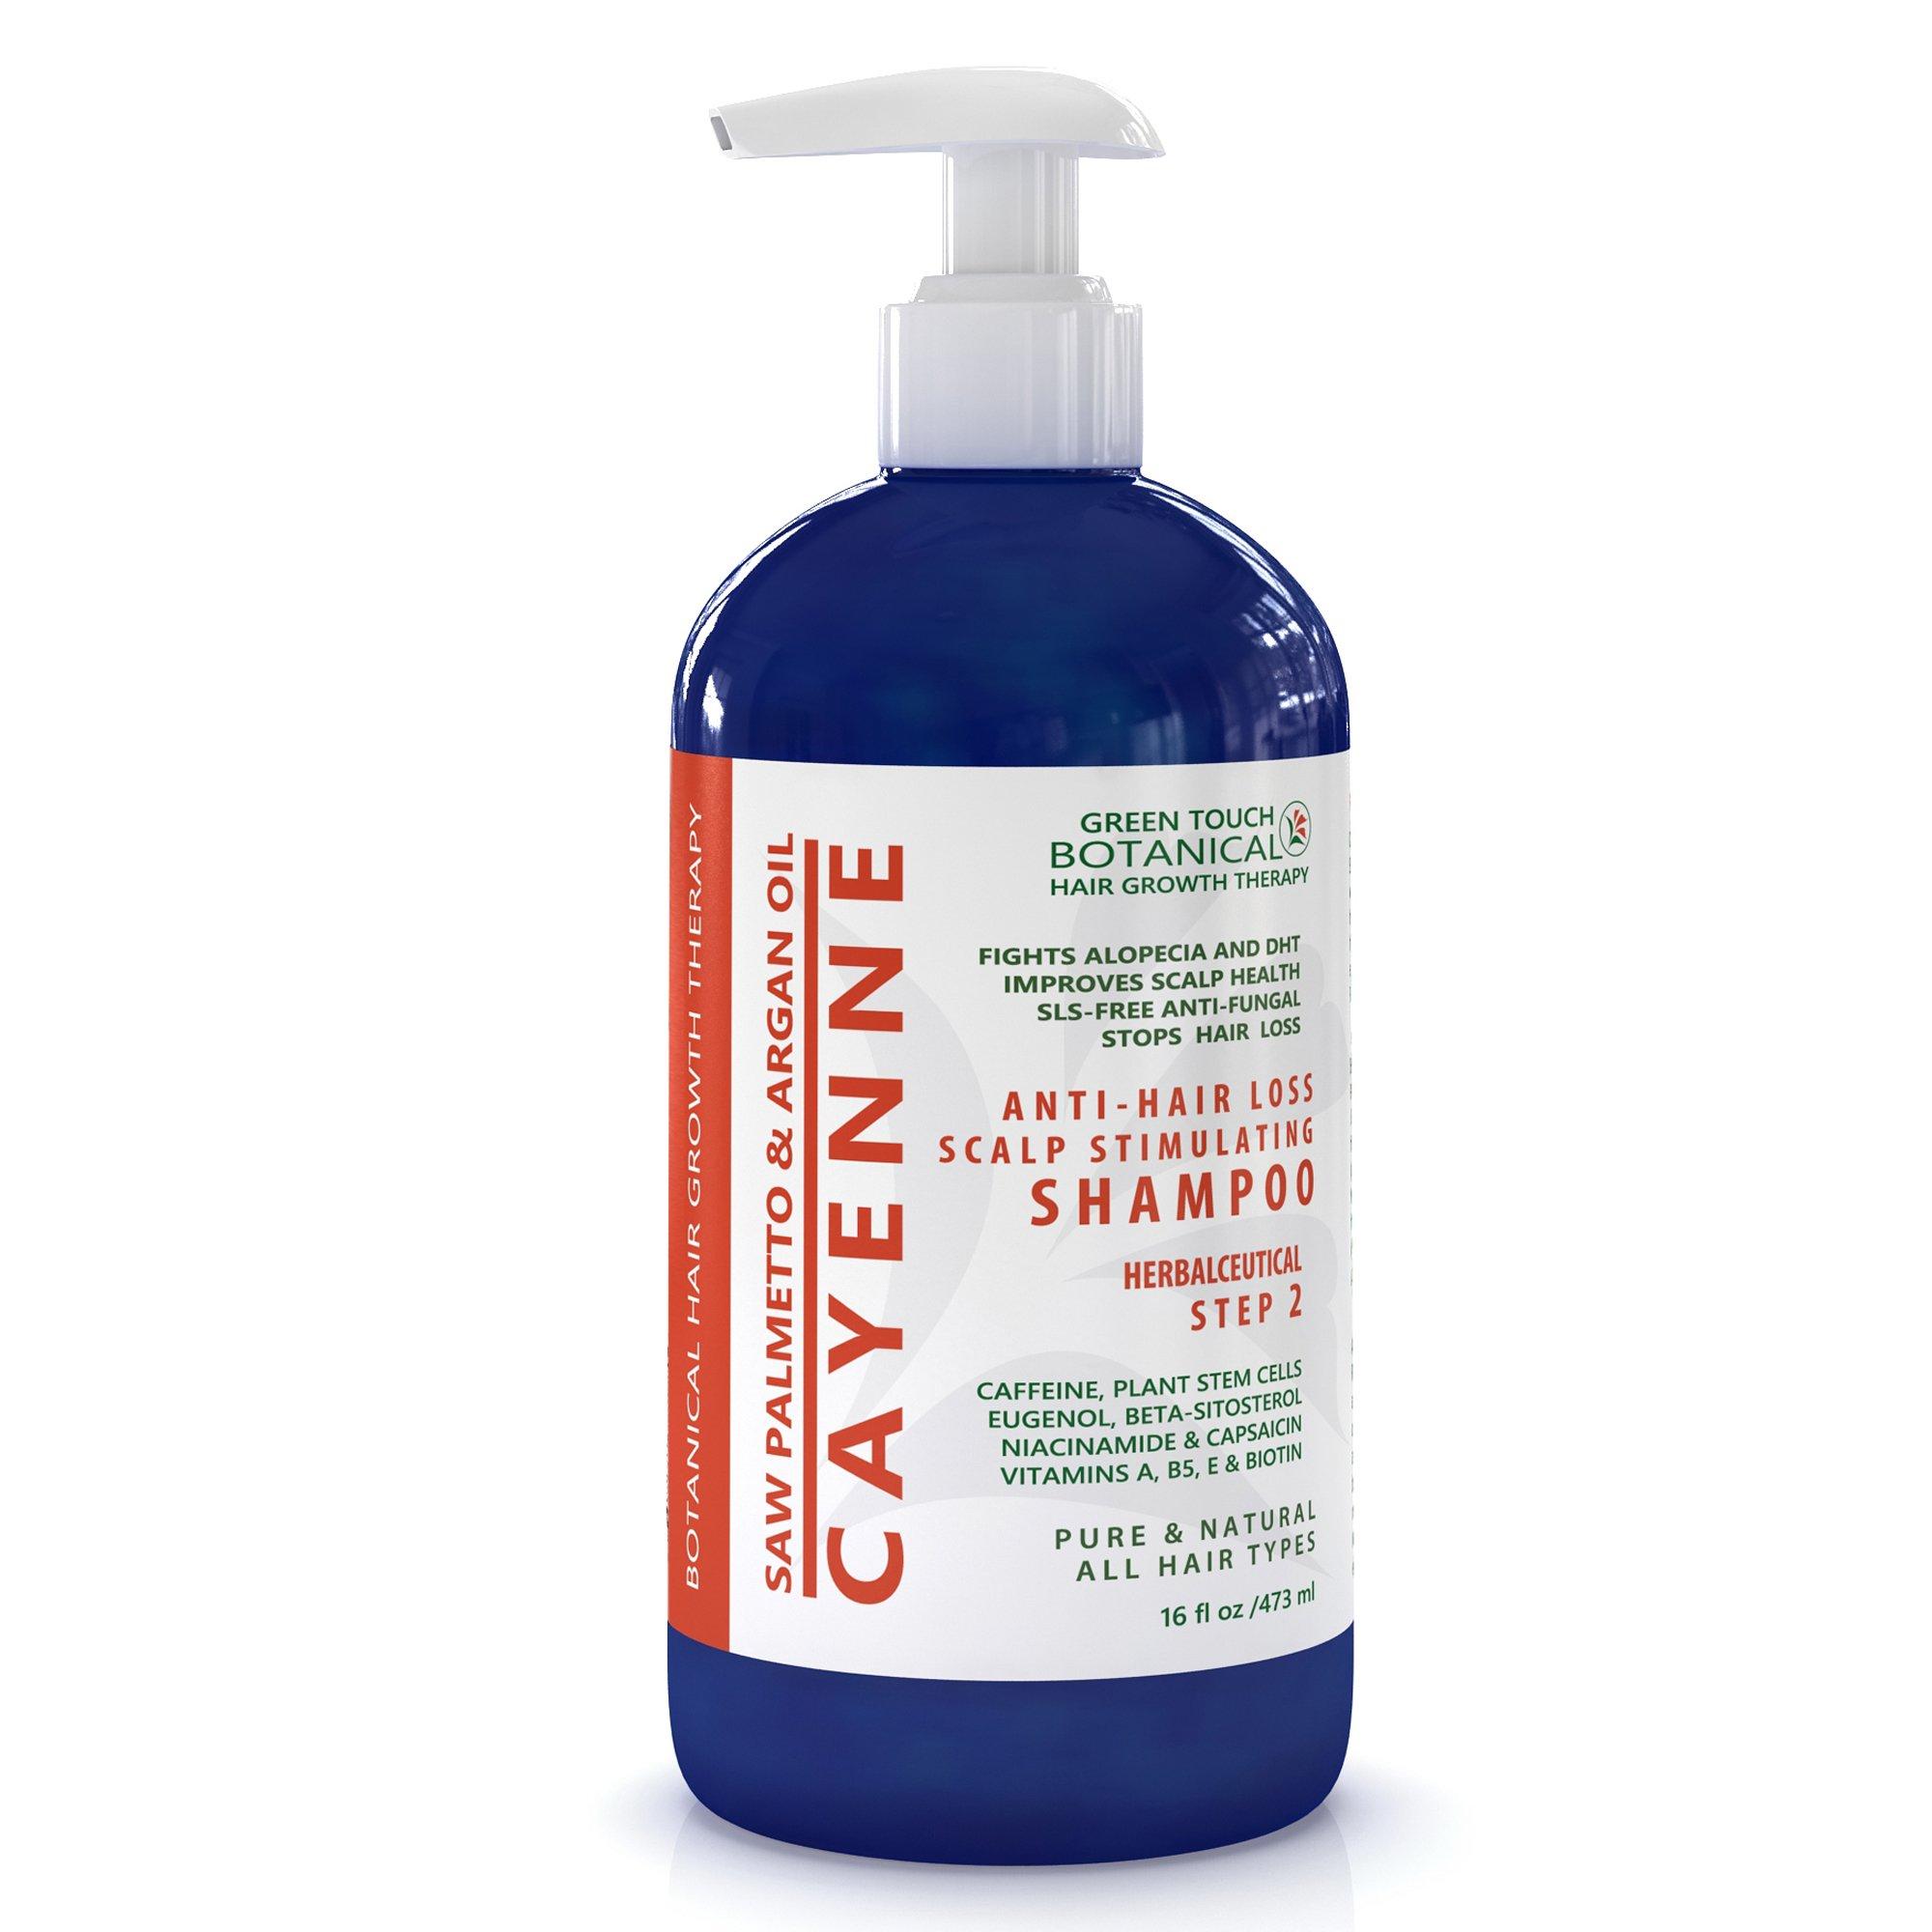 Hair Growth Botanical STEP 2: Anti Hair Loss Organic Shampoo Capsaicin + HerbalCeutical with Saw Palmetto For Hair Growth And Scalp Stimulation (16 Fl Oz)